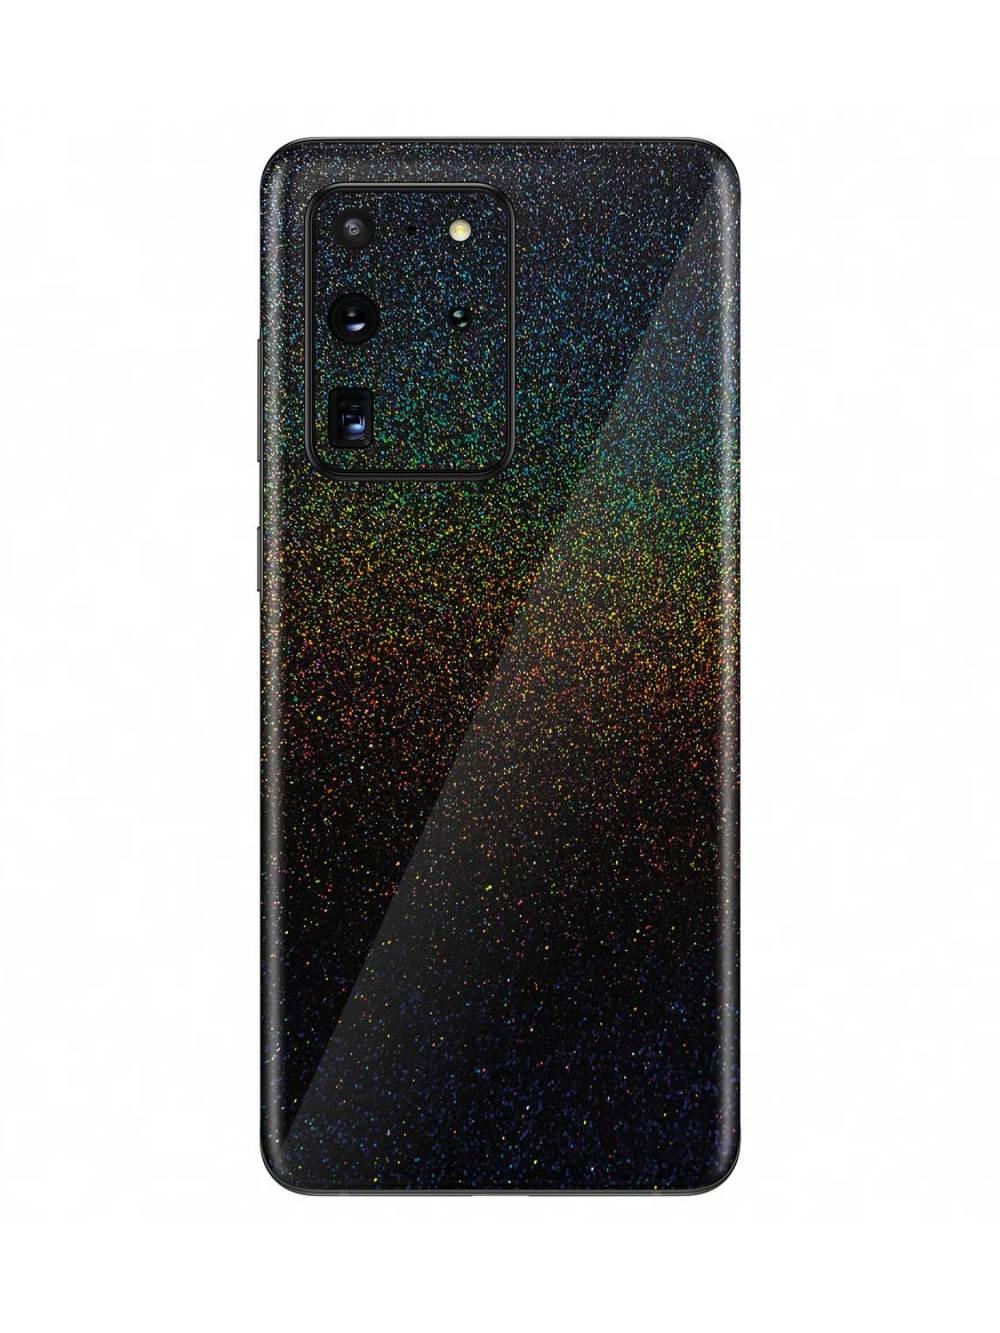 Cosmic Morpheus Skin for Samsung Galaxy S20 Ultra